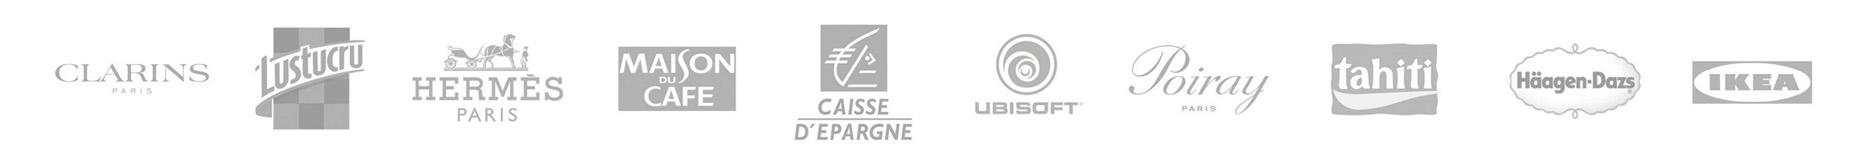 logosKS3D.jpg